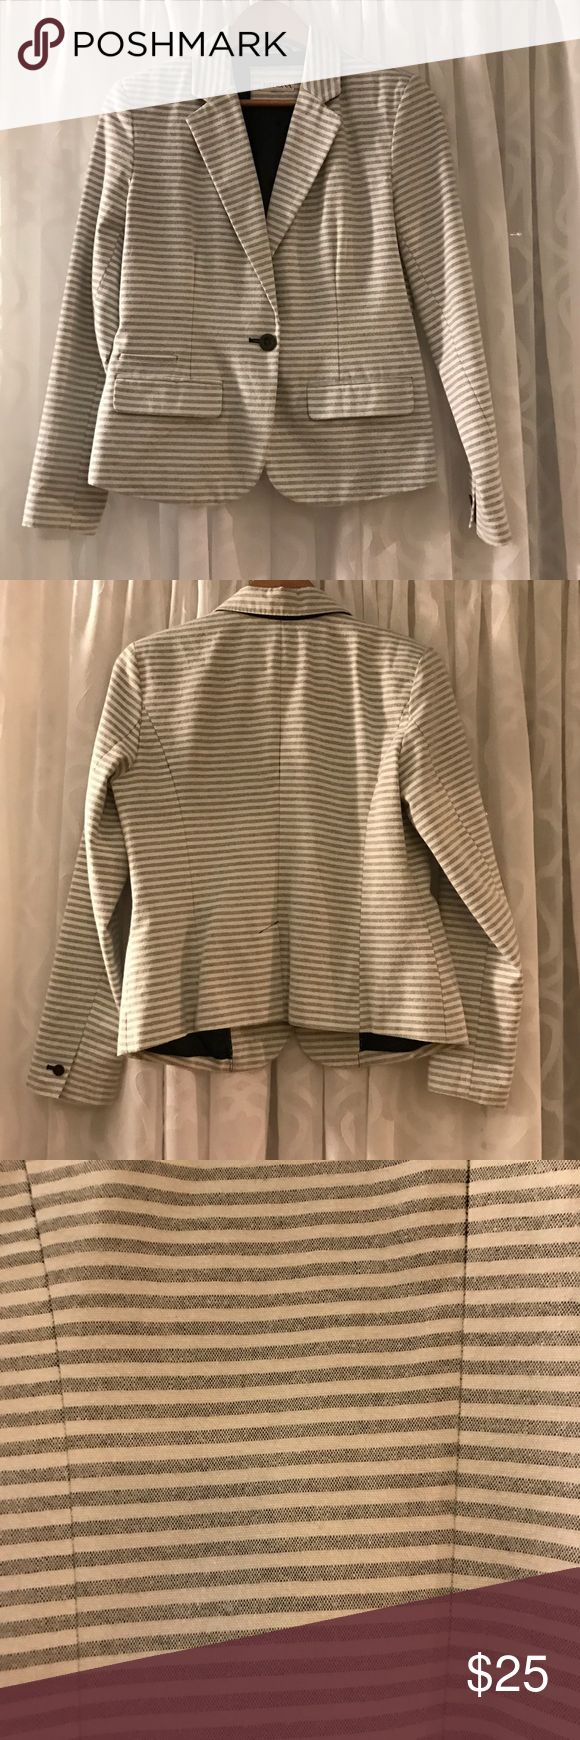 Merona - women's seersucker blazer - size large Merona - women's seersucker blazer - size large - never worn - MAKE AN OFFER! Merona Jackets & Coats Blazers